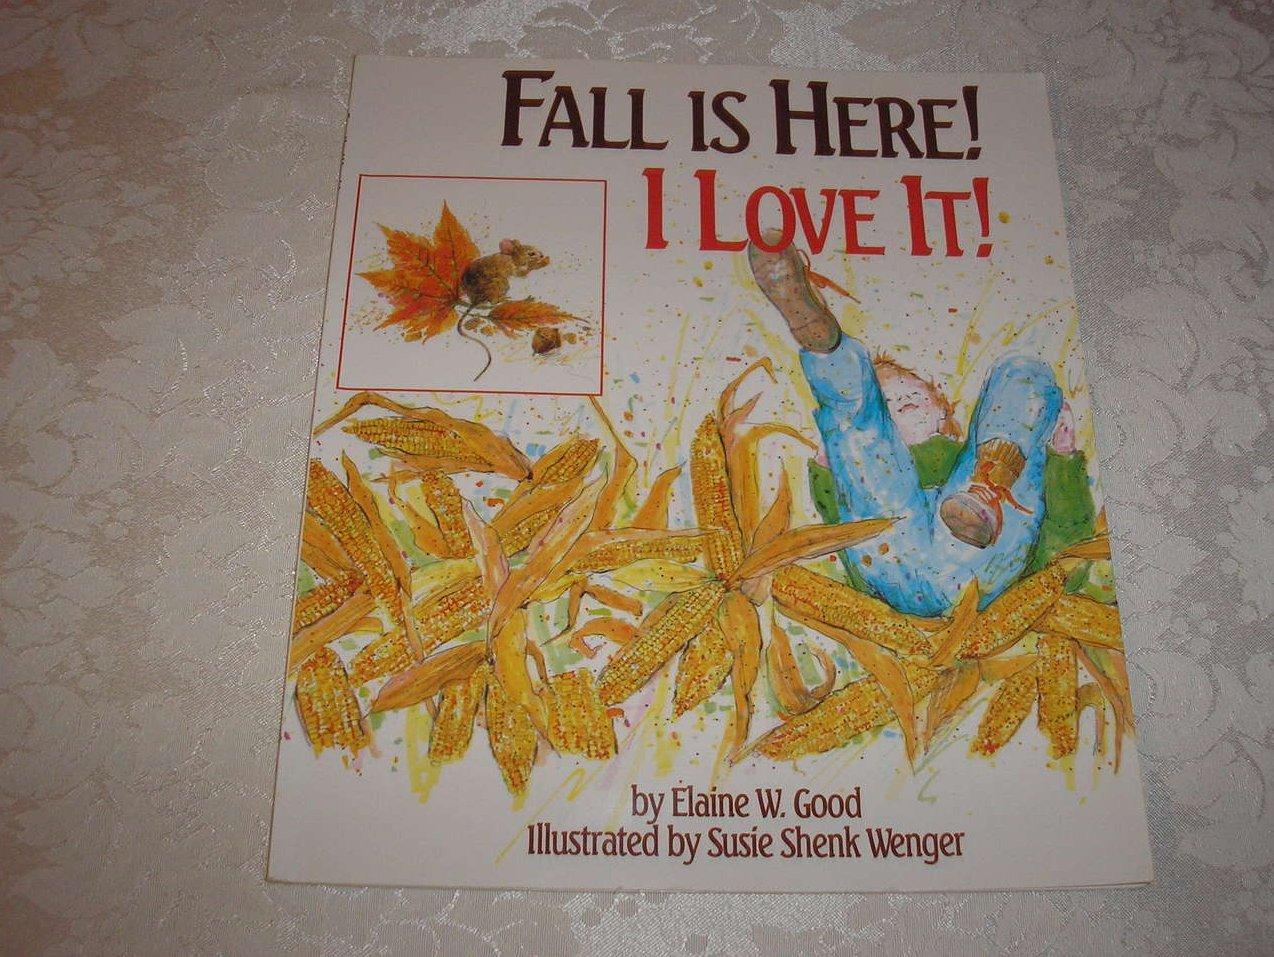 Fall Is Here! I Love It! Elaine W. Good very good sc